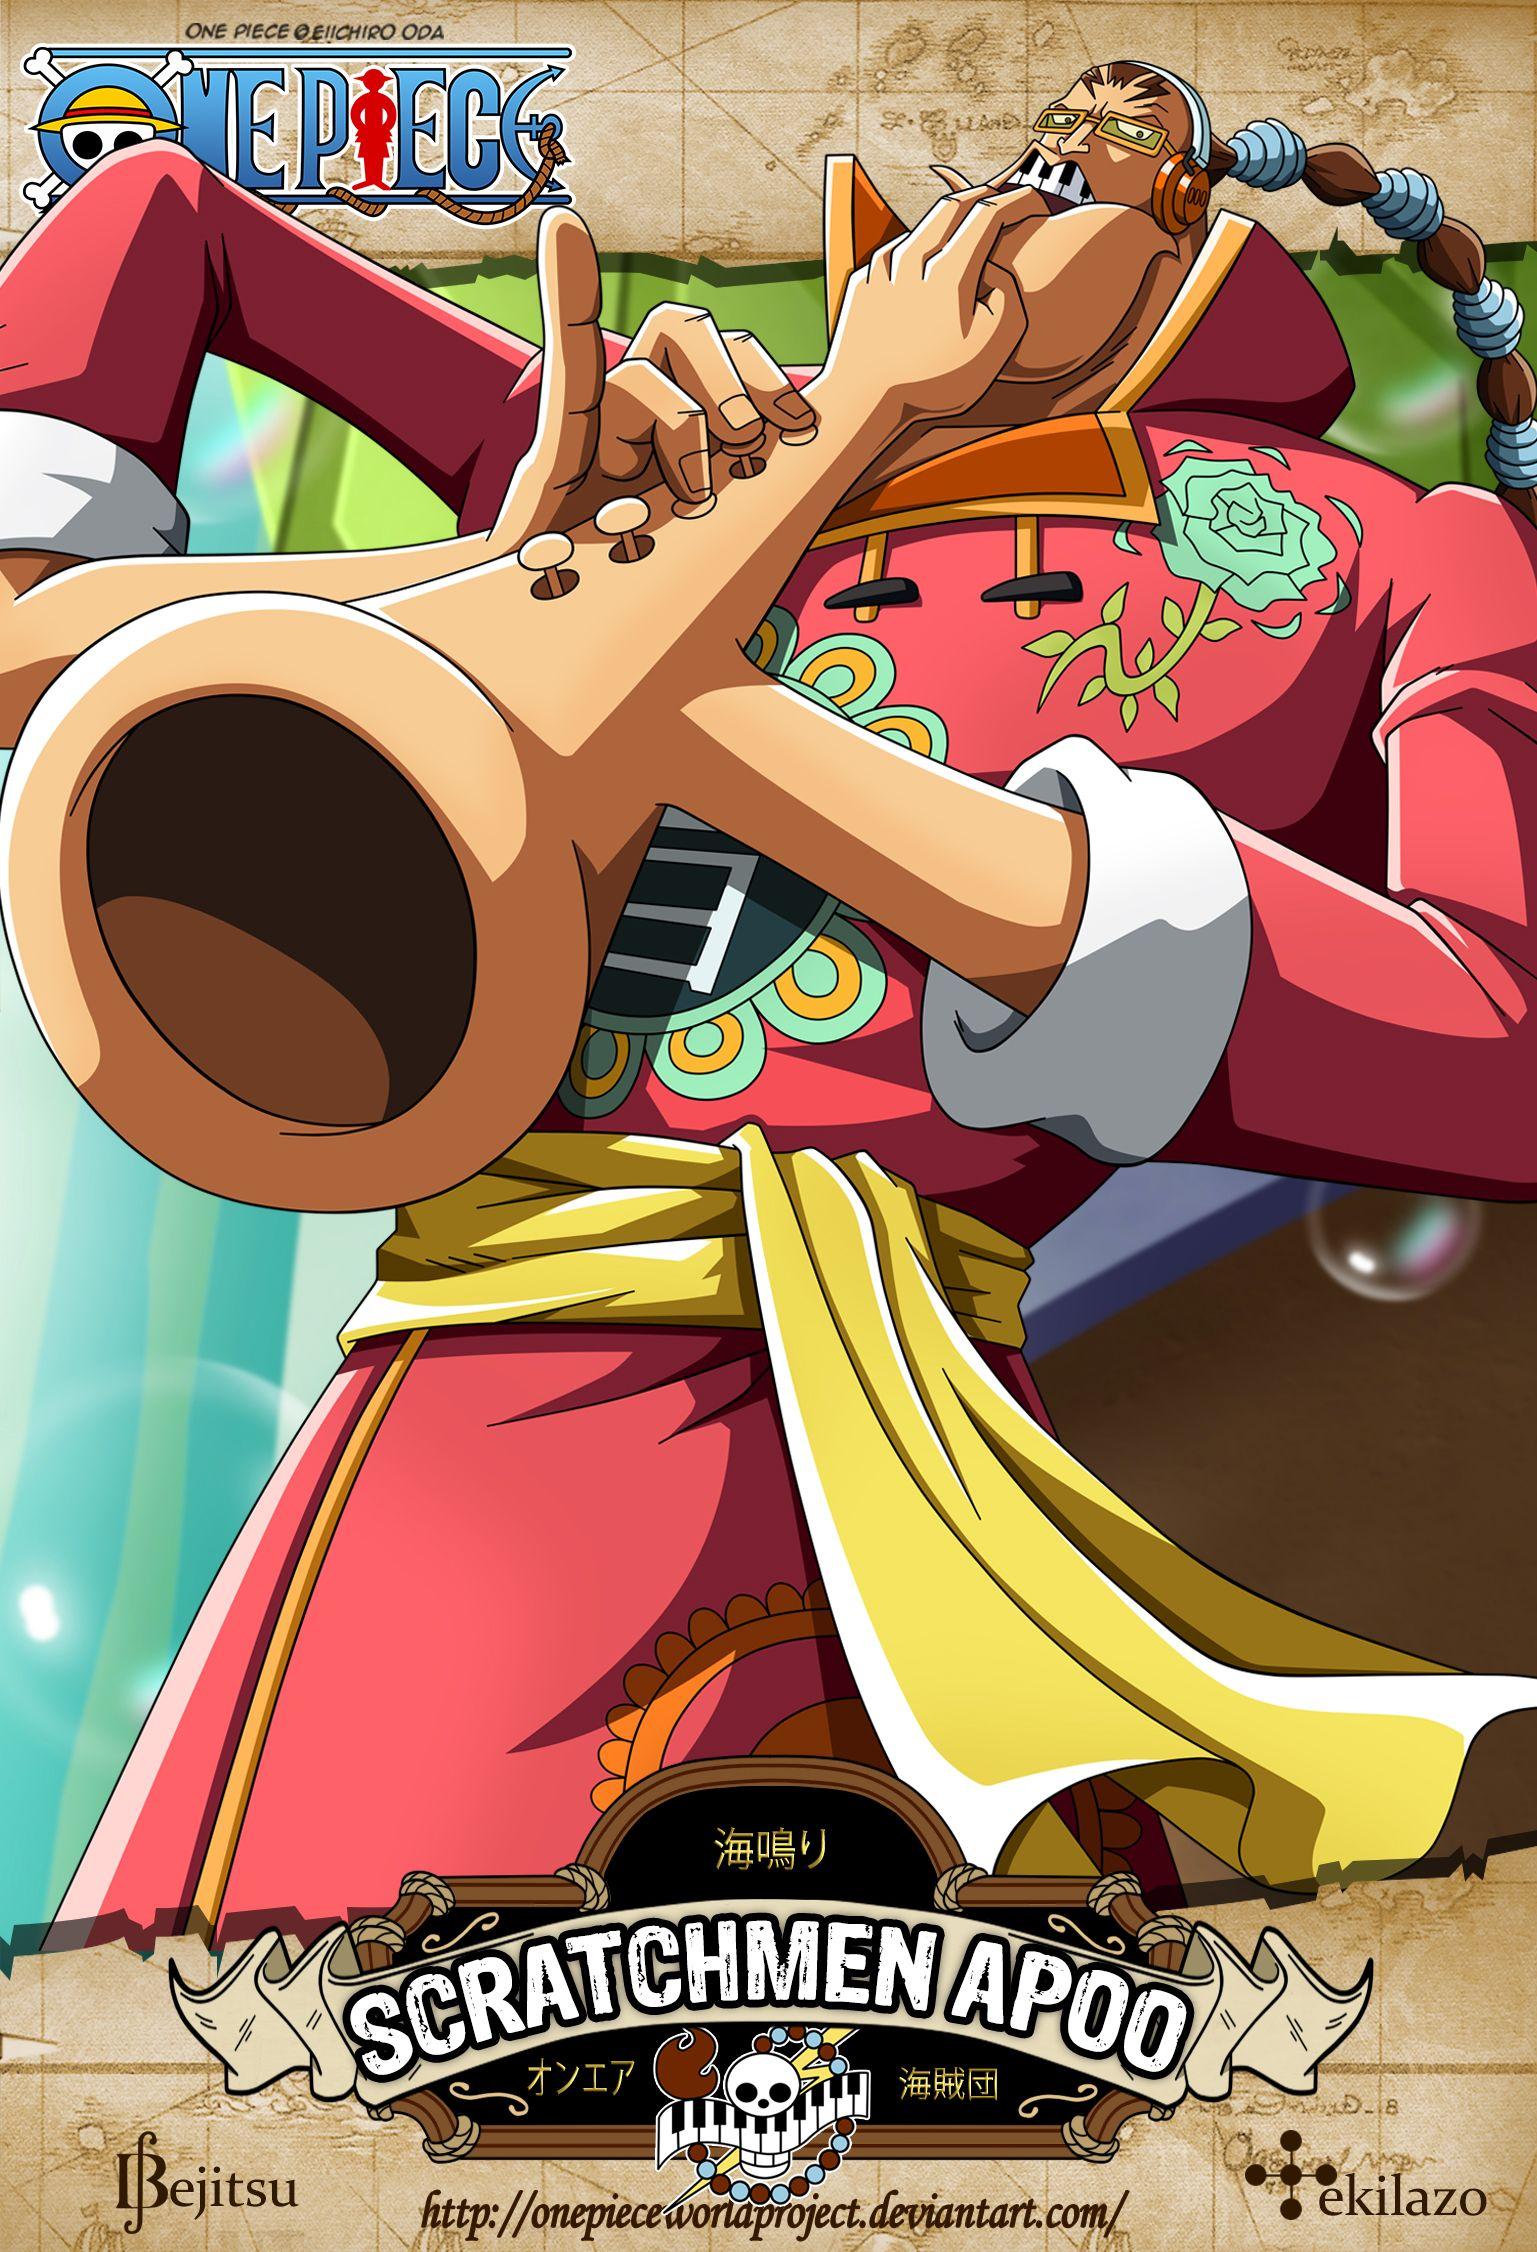 One Piece - Scratchmen Apoo by OnePieceWorldProject.deviantart.com on @DeviantArt